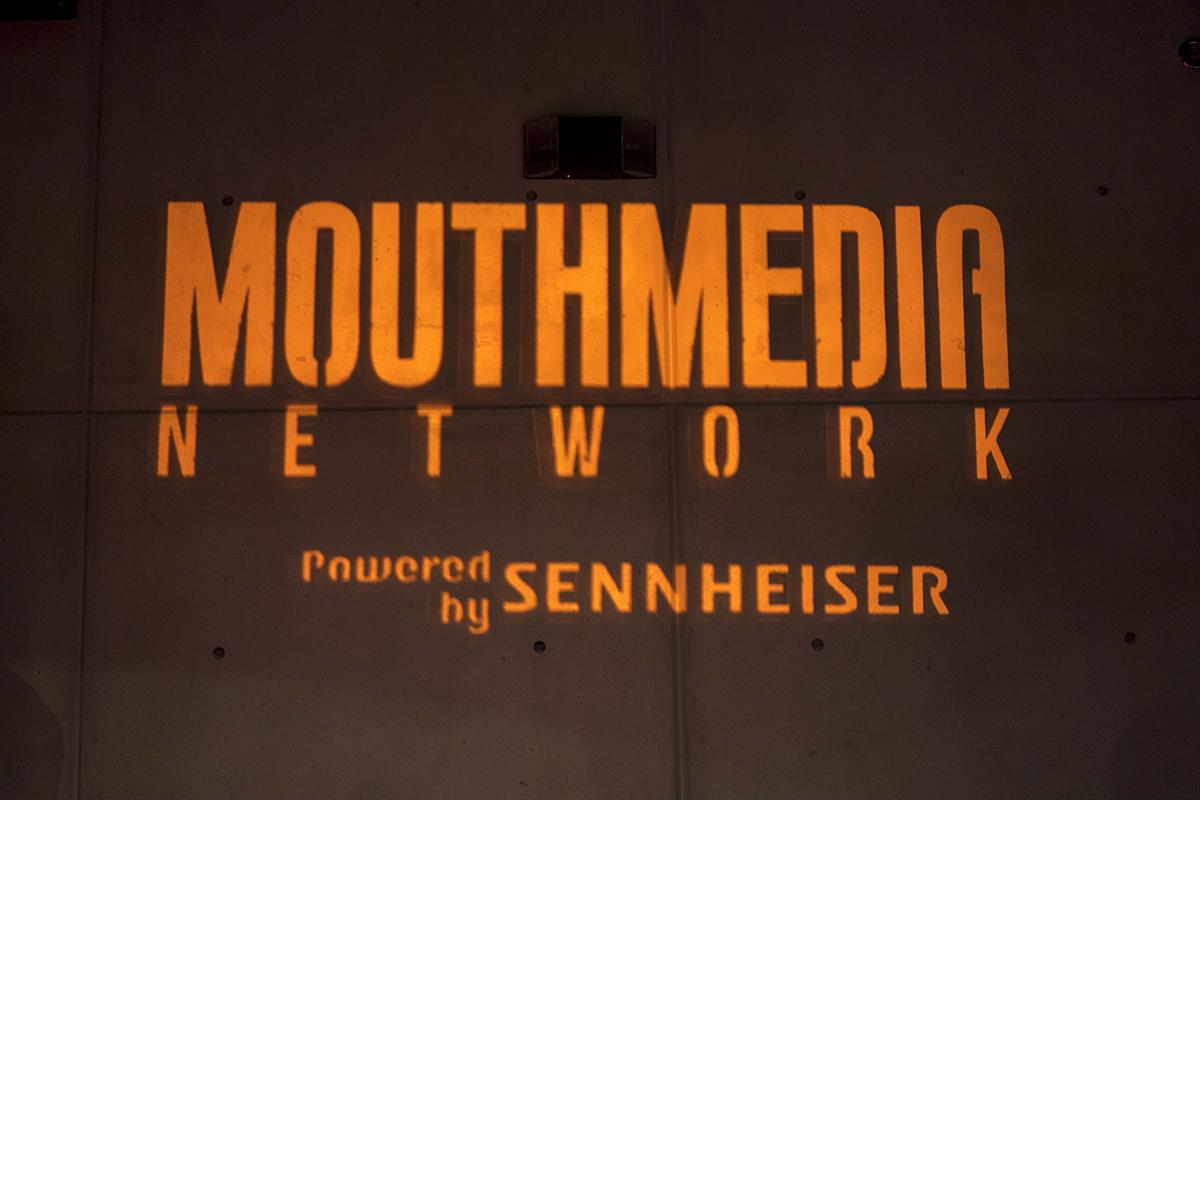 MouthMedia_DVF-101_square_sm.png